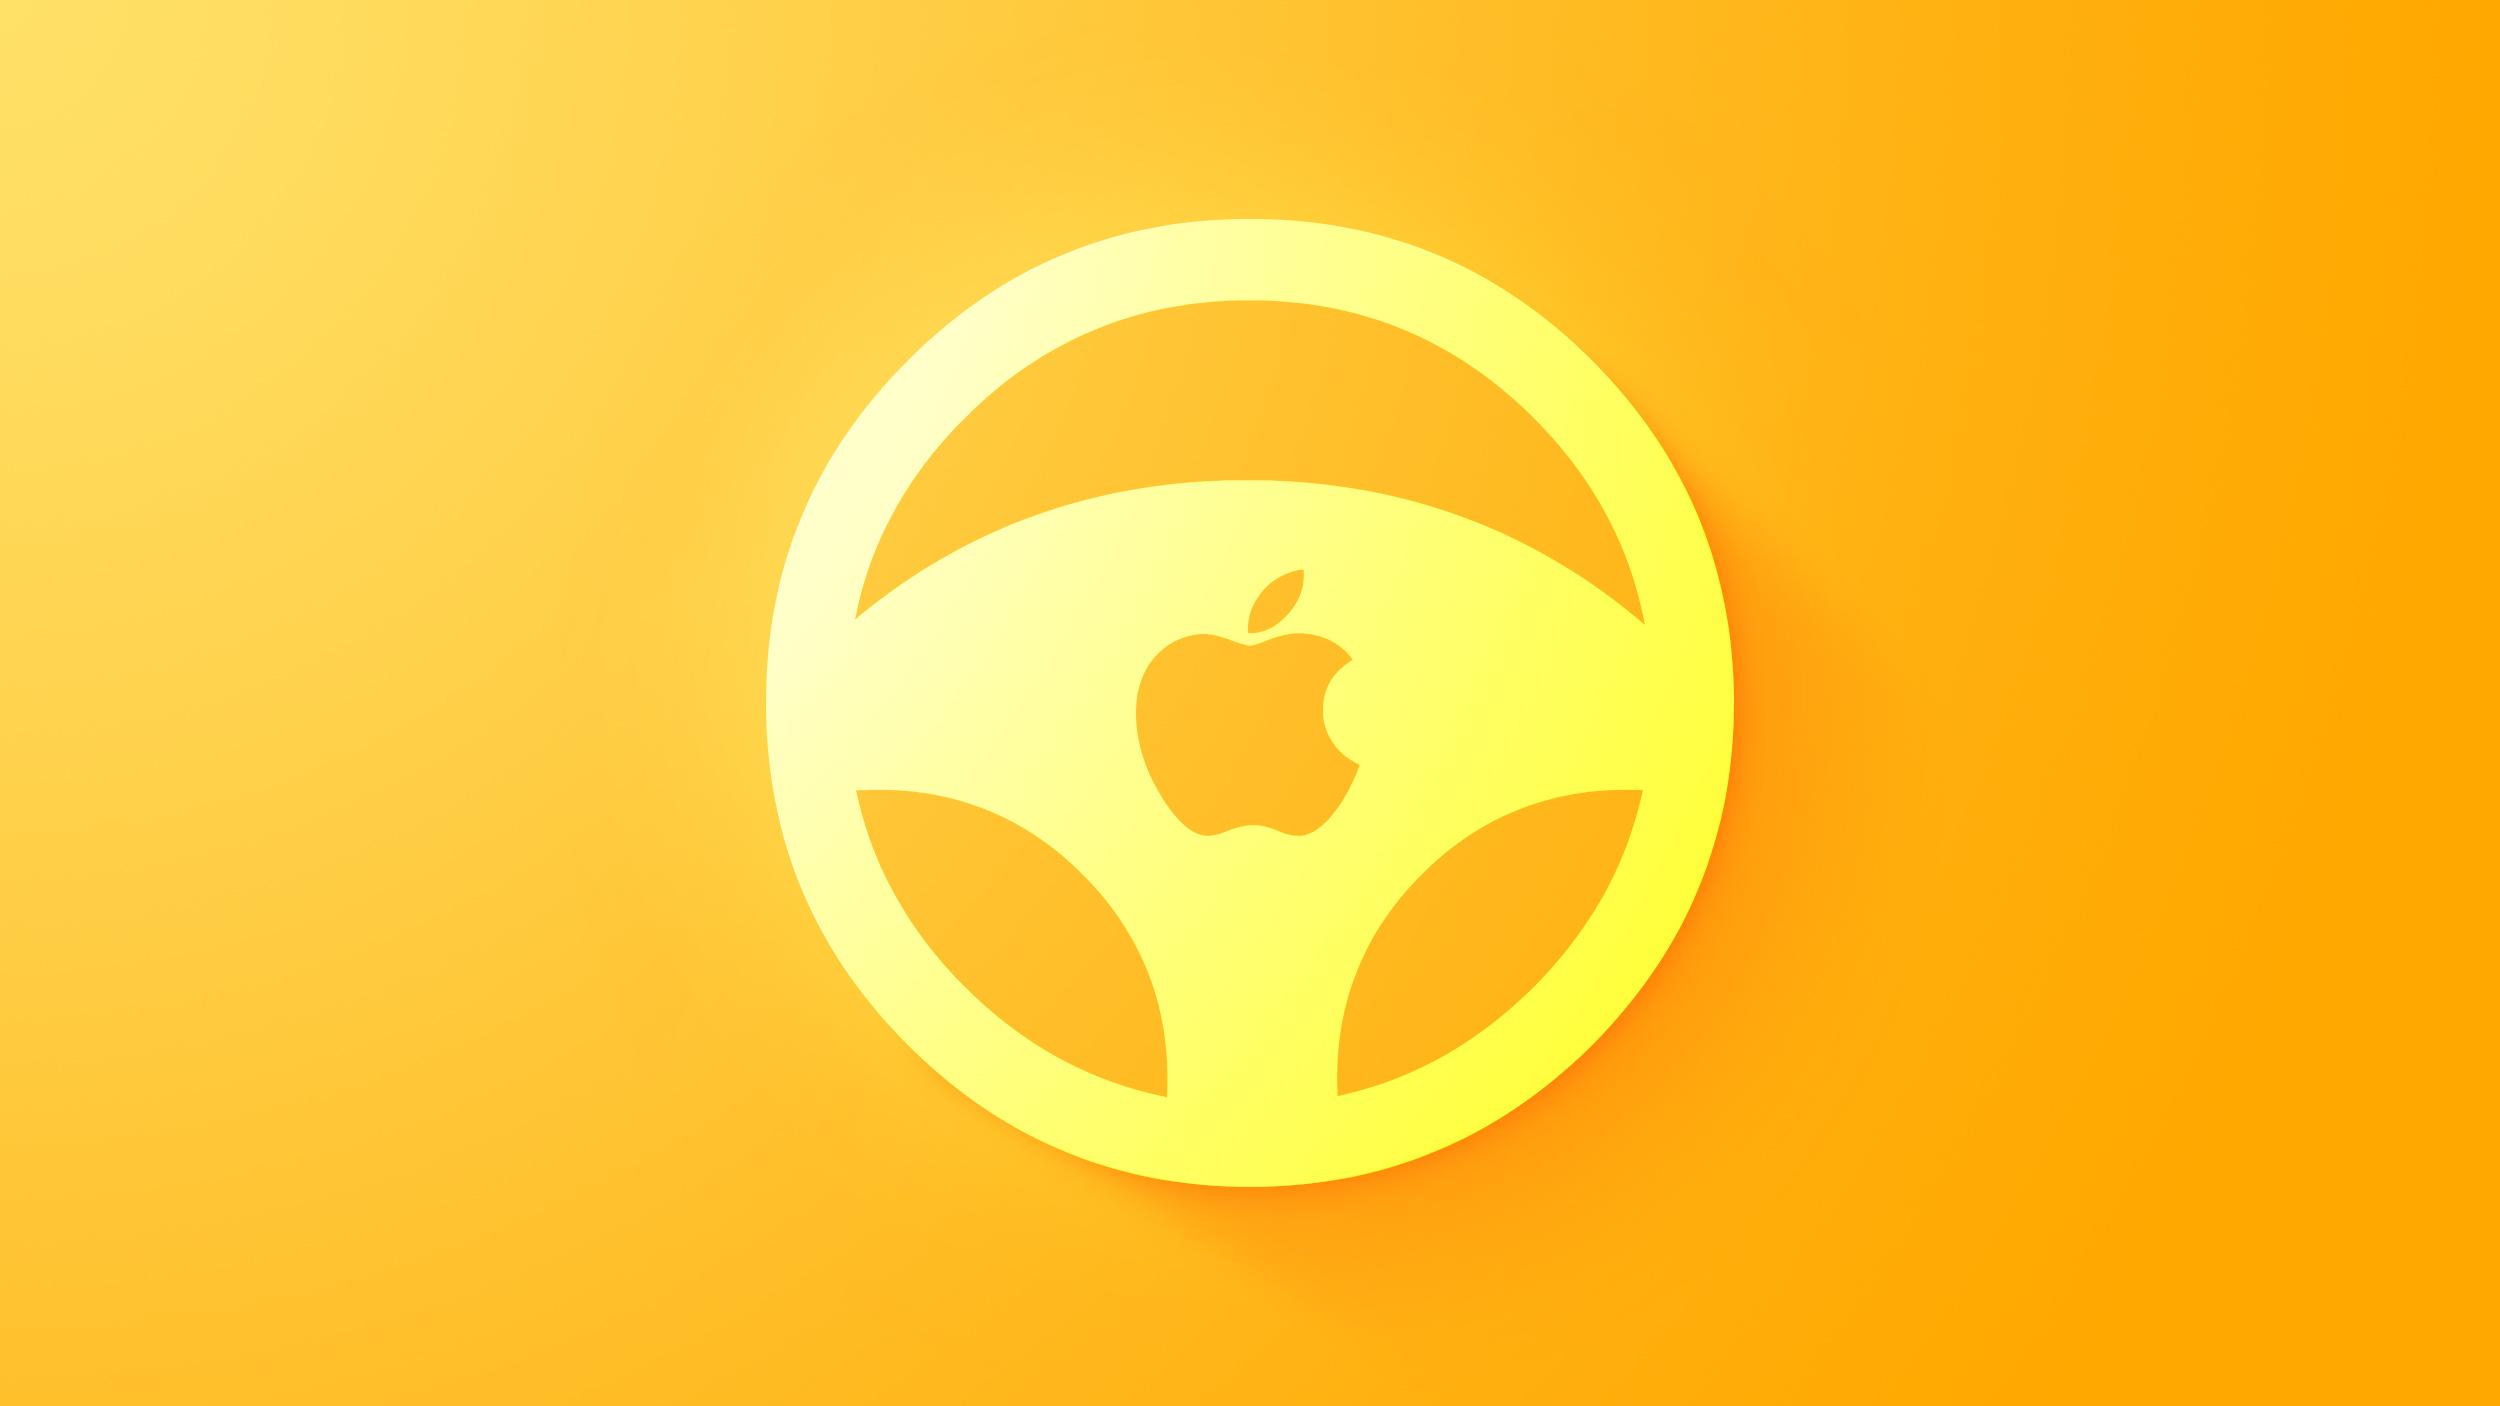 Apple-car-wheel-icon-feature-yellow-1.jpg